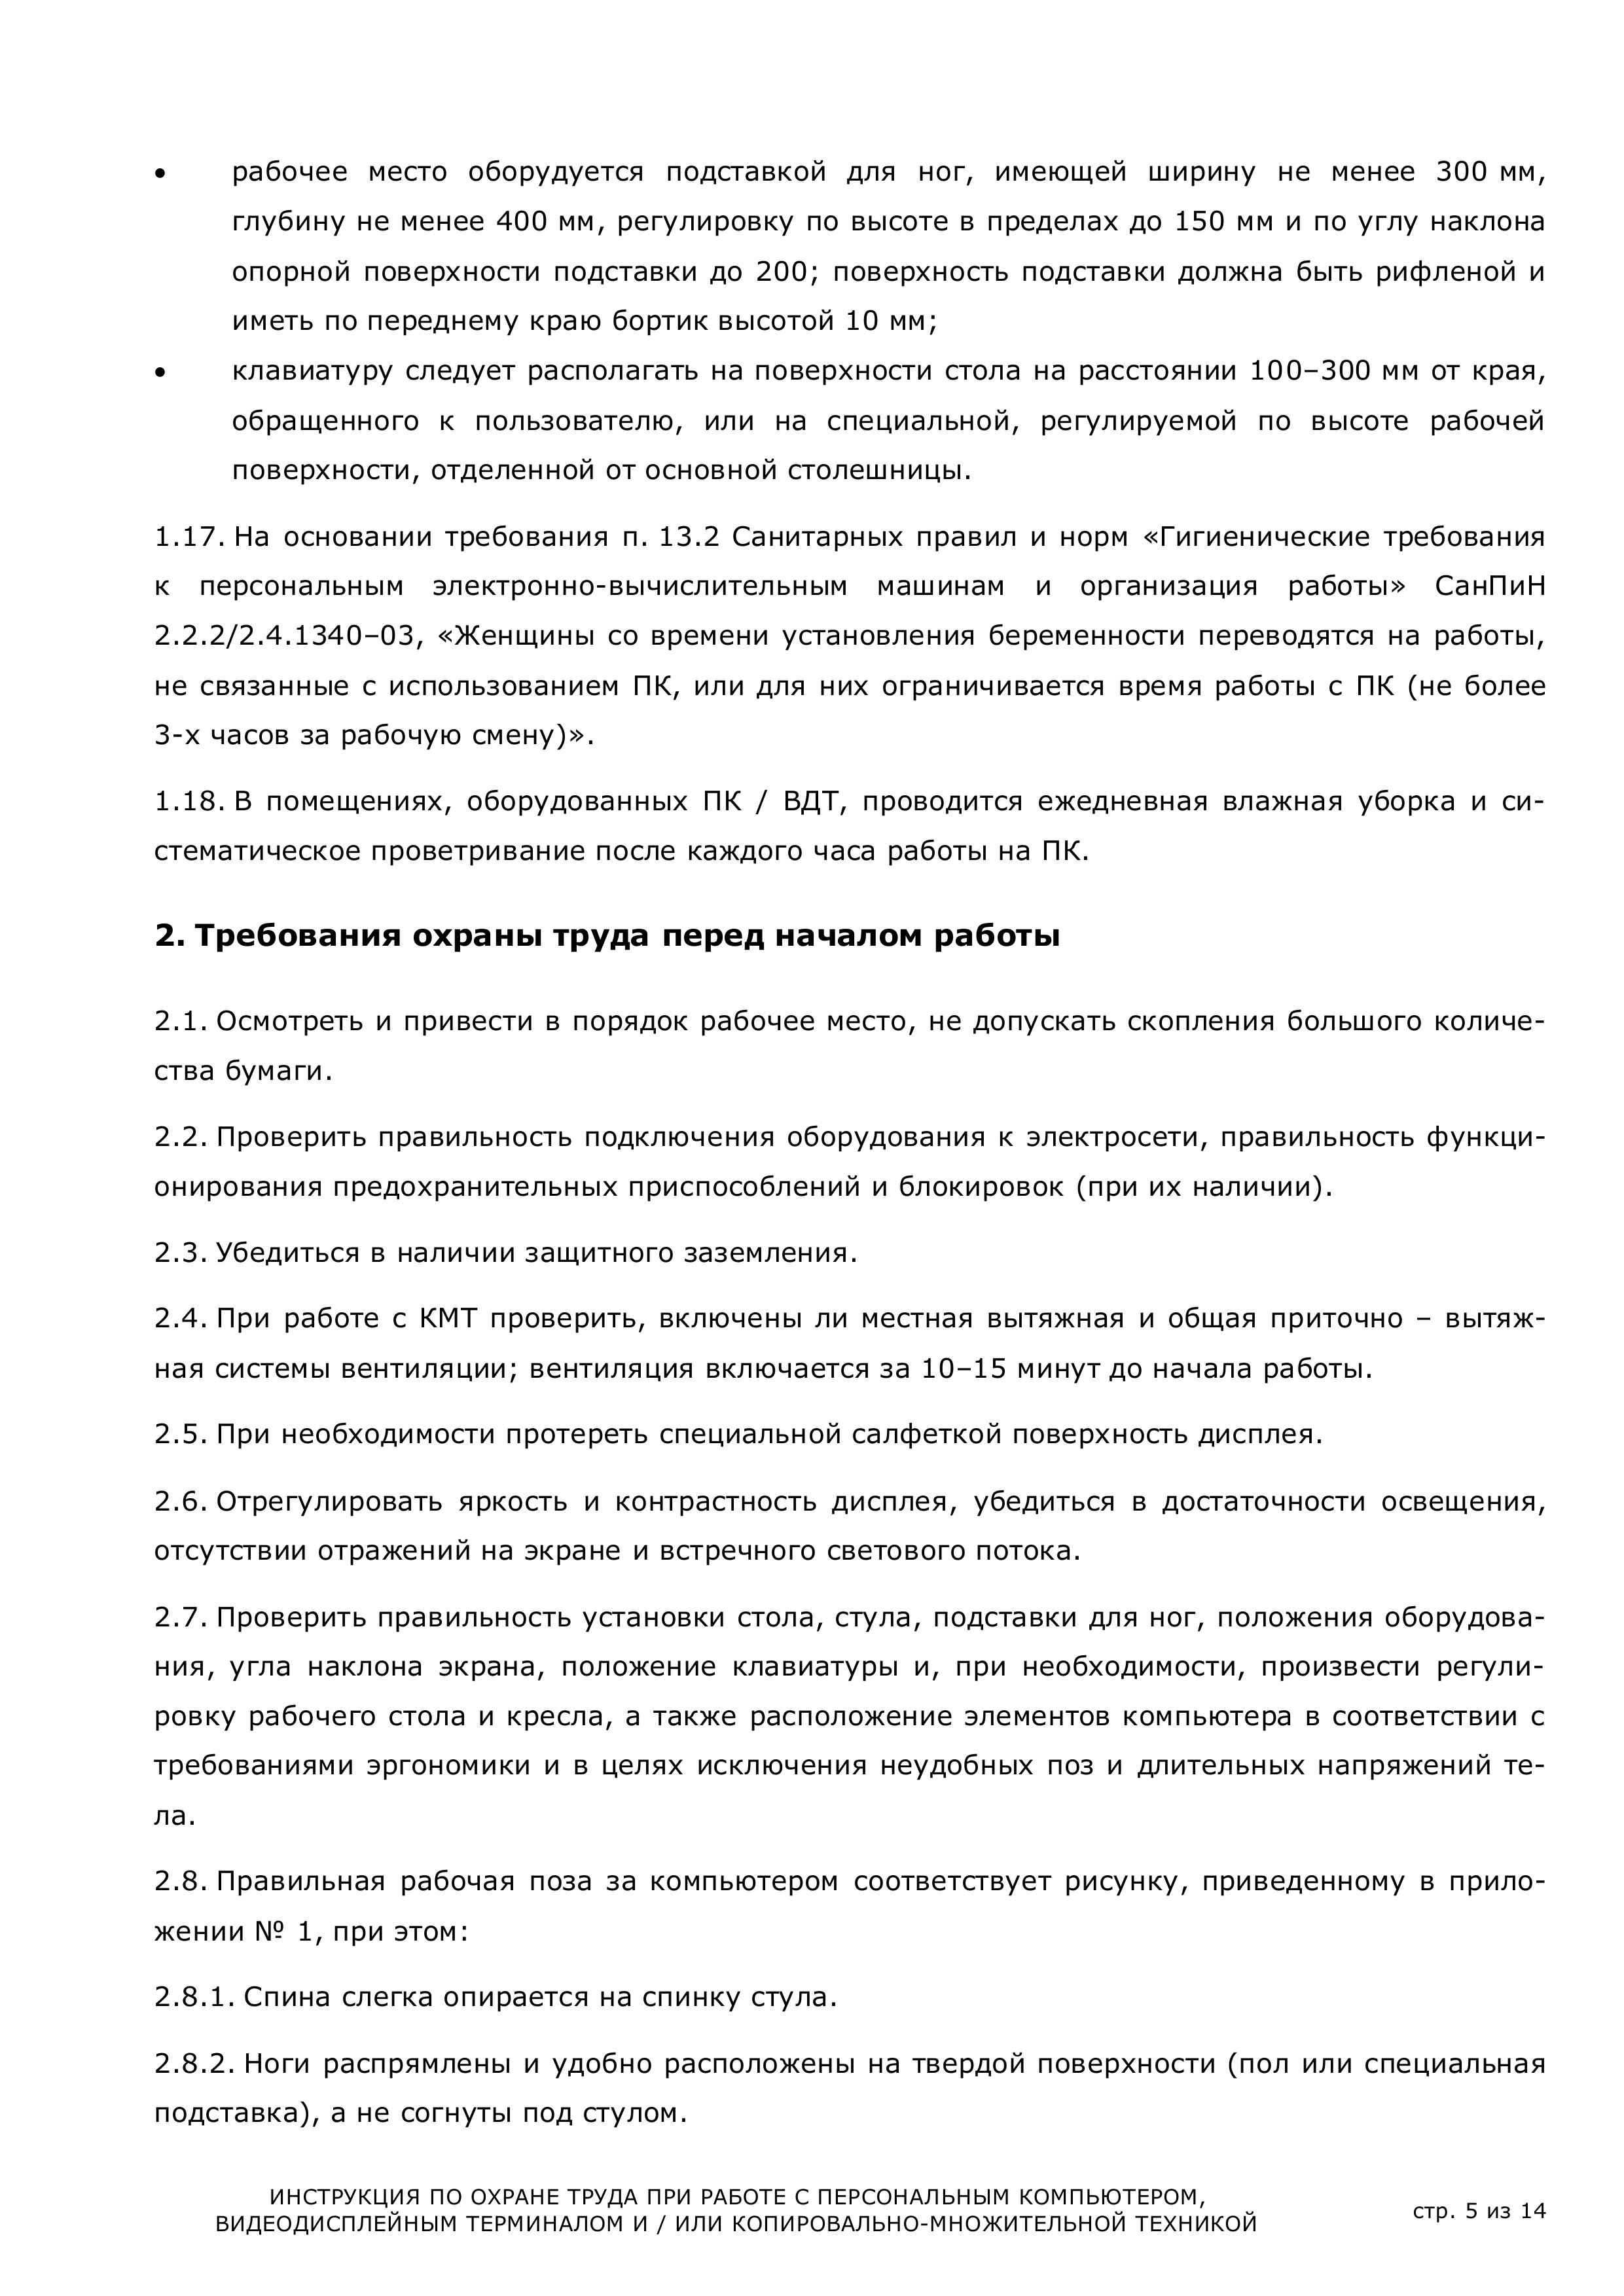 инструкция по охране труда при работе на токарном станке на сверлильном станке